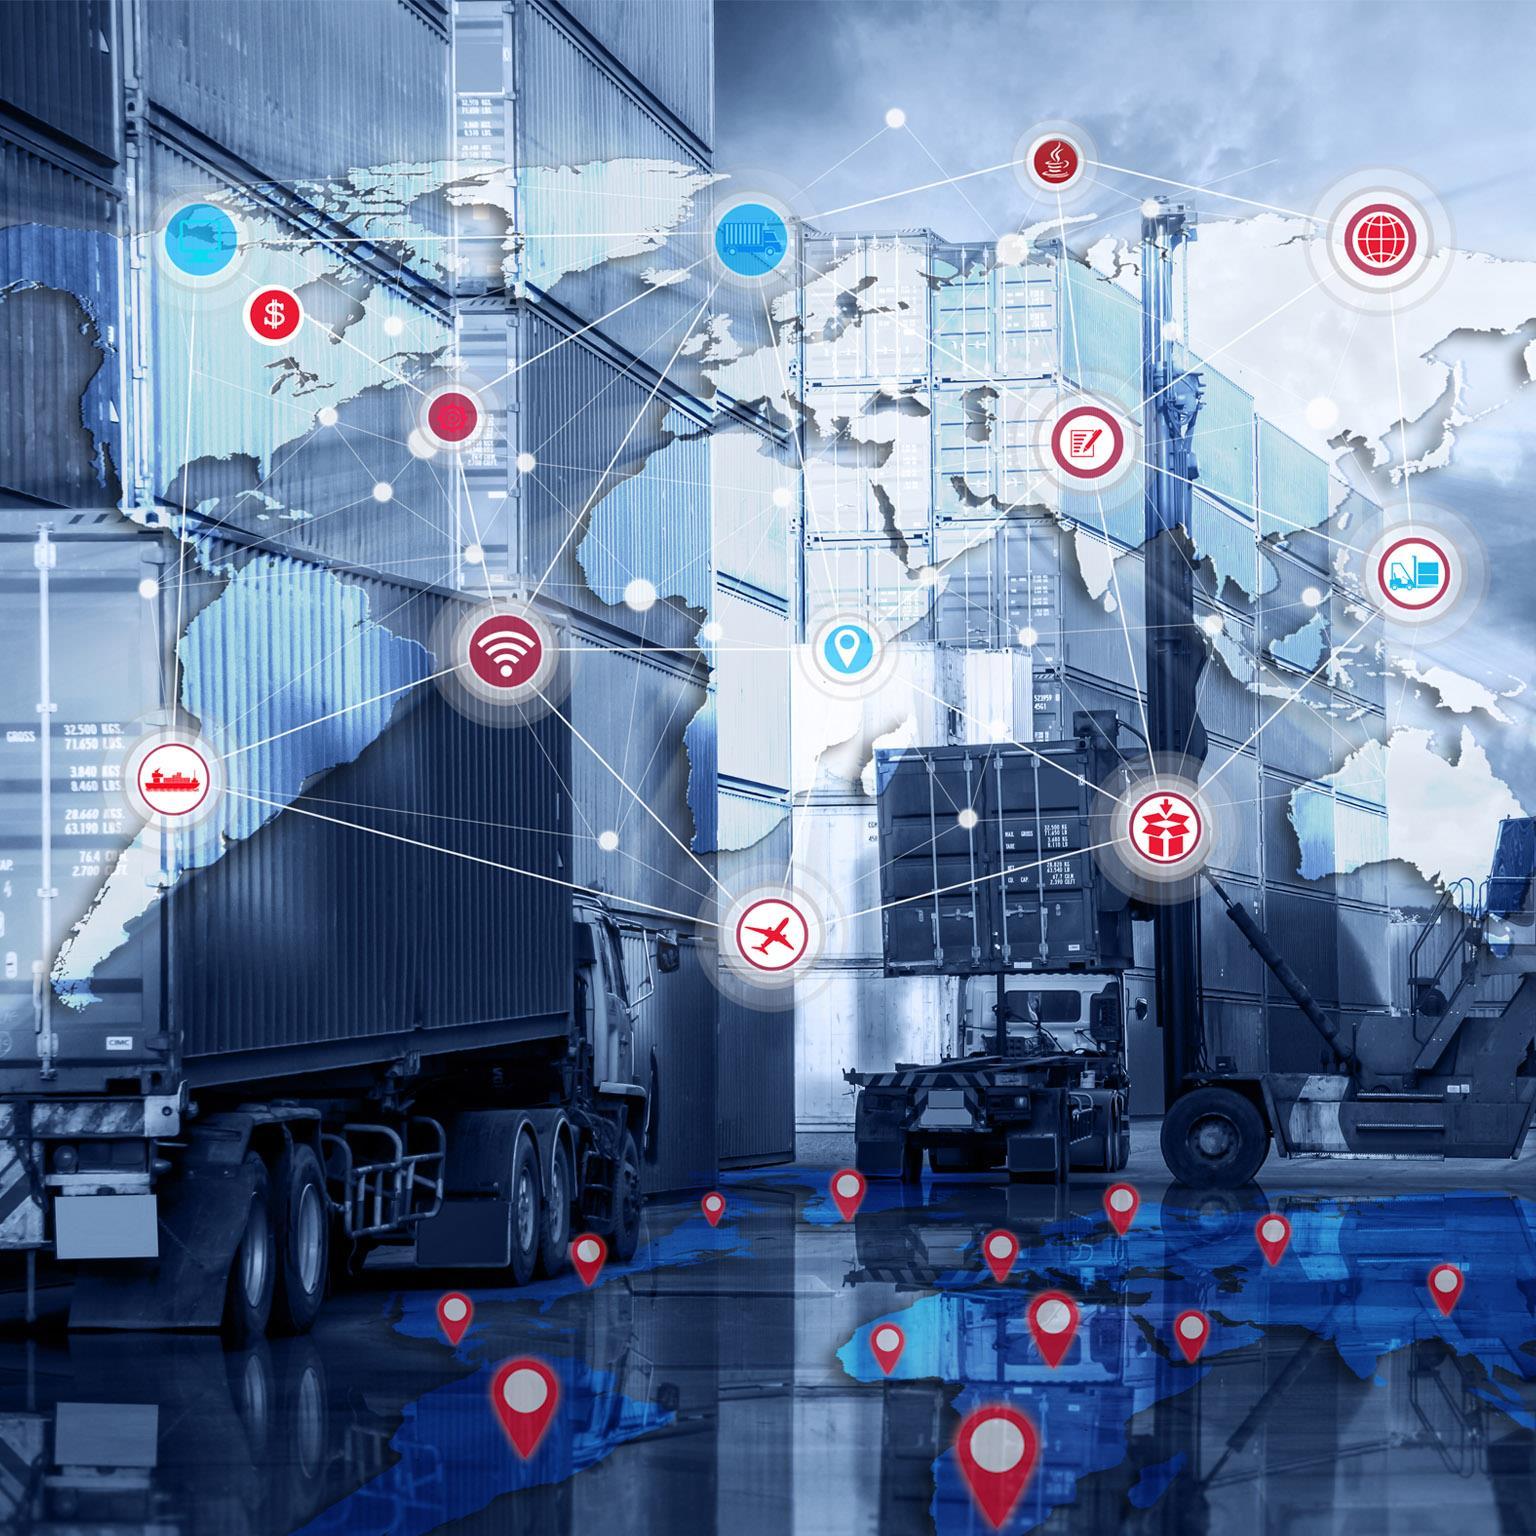 Taking the pulse of enterprise IoT